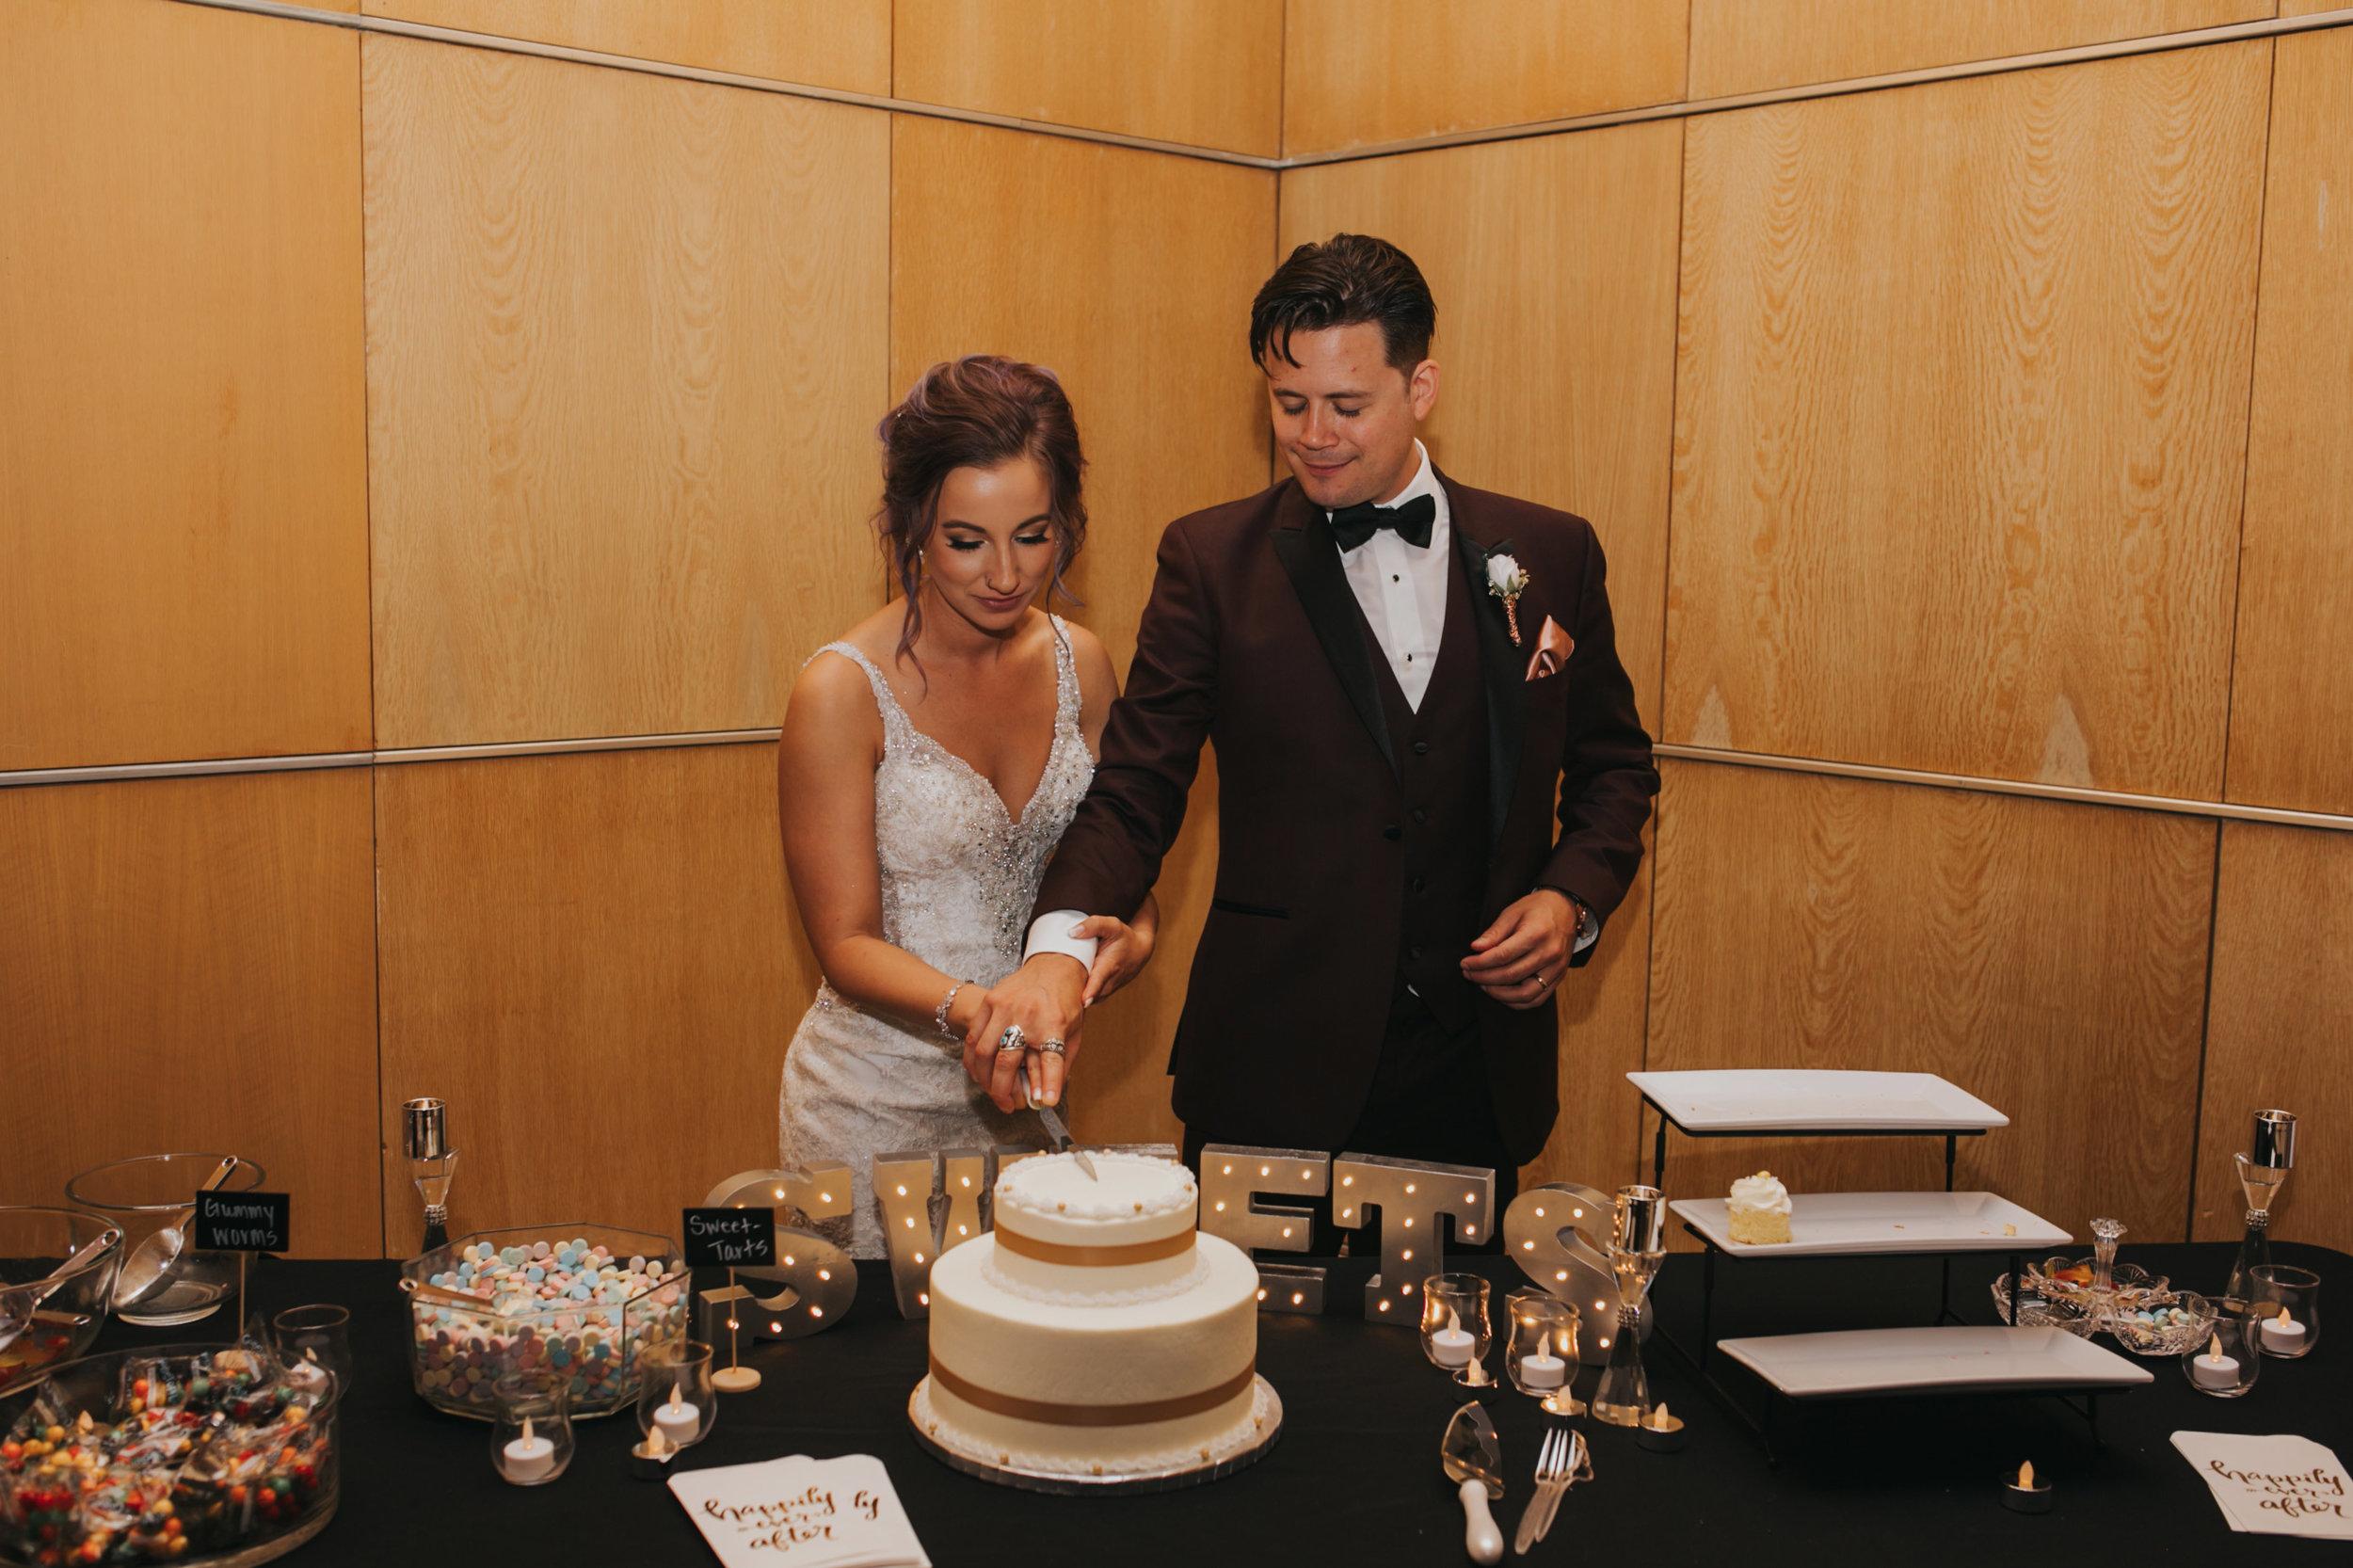 bride-groom-cutting-cake-desmoines-iowa-art-center-raelyn-ramey-photography.jpg